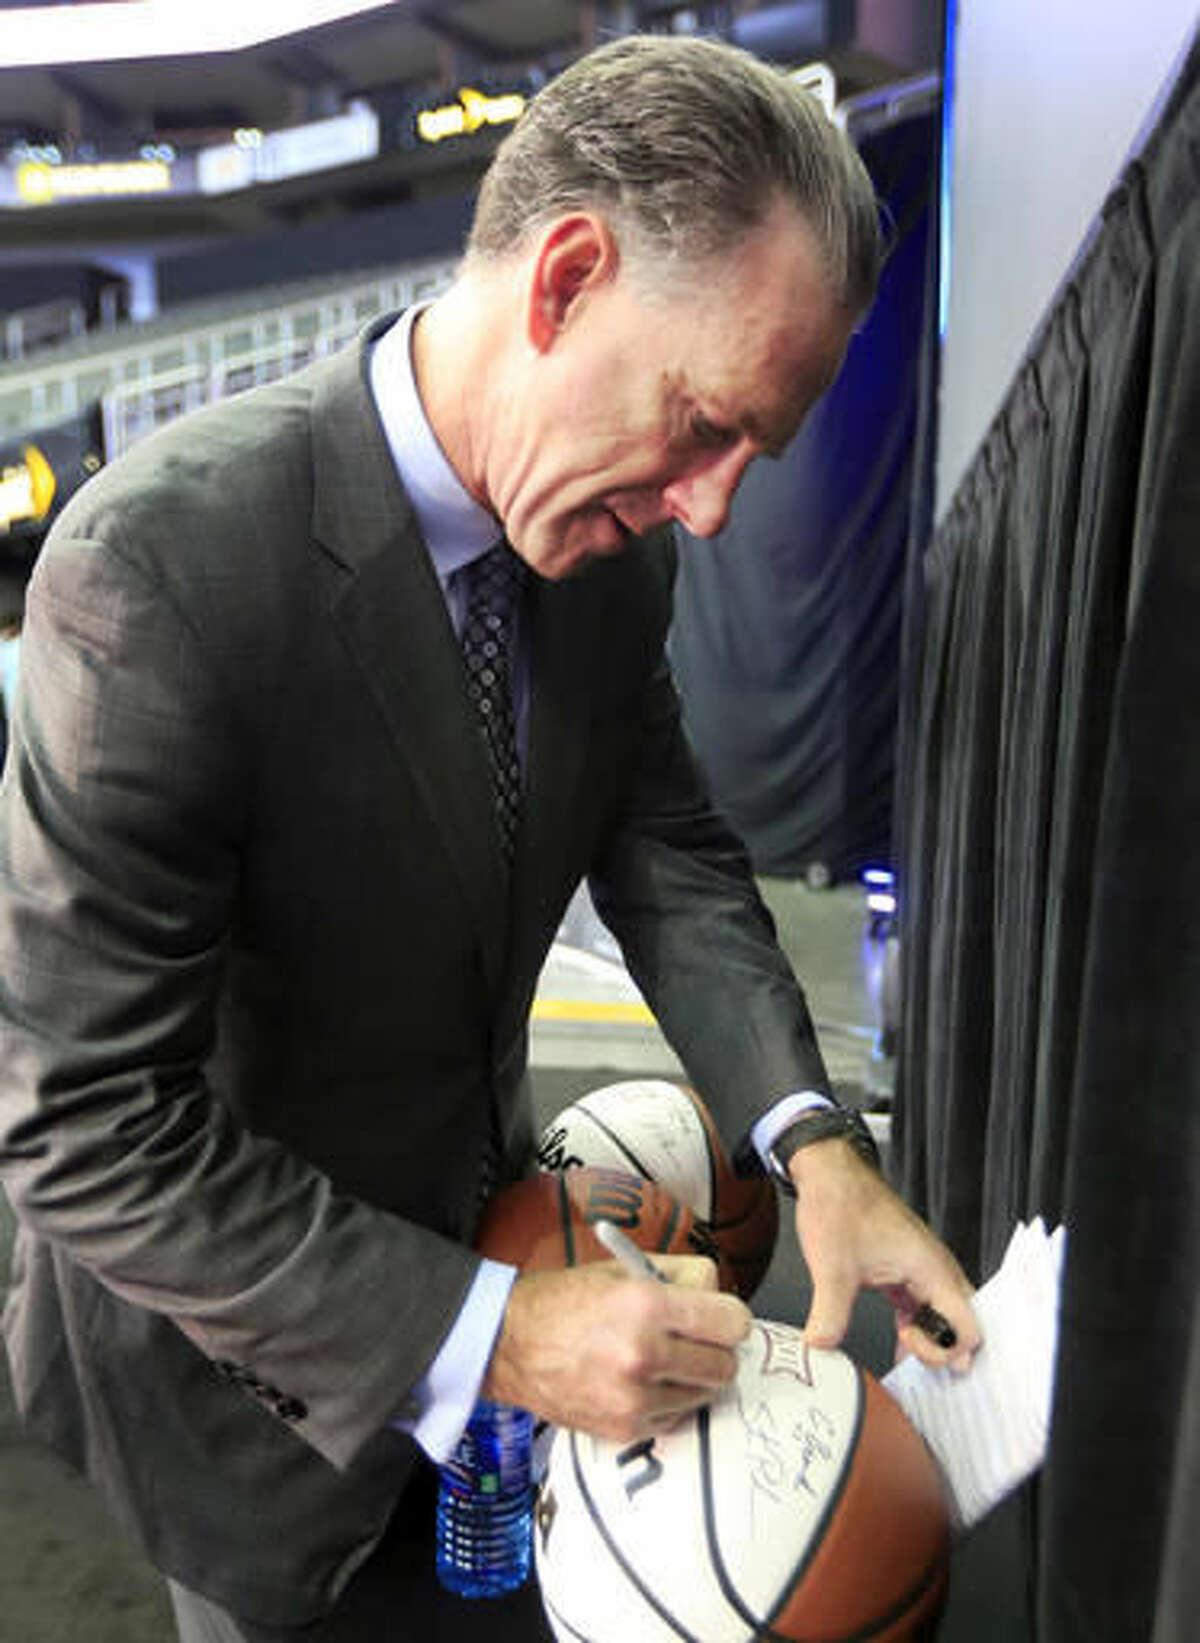 TCU coach Jamie Dixon autographs balls during Big 12 NCAA college basketball media day in Kansas City, Mo., Tuesday, Oct. 25, 2016. (AP Photo/Orlin Wagner)